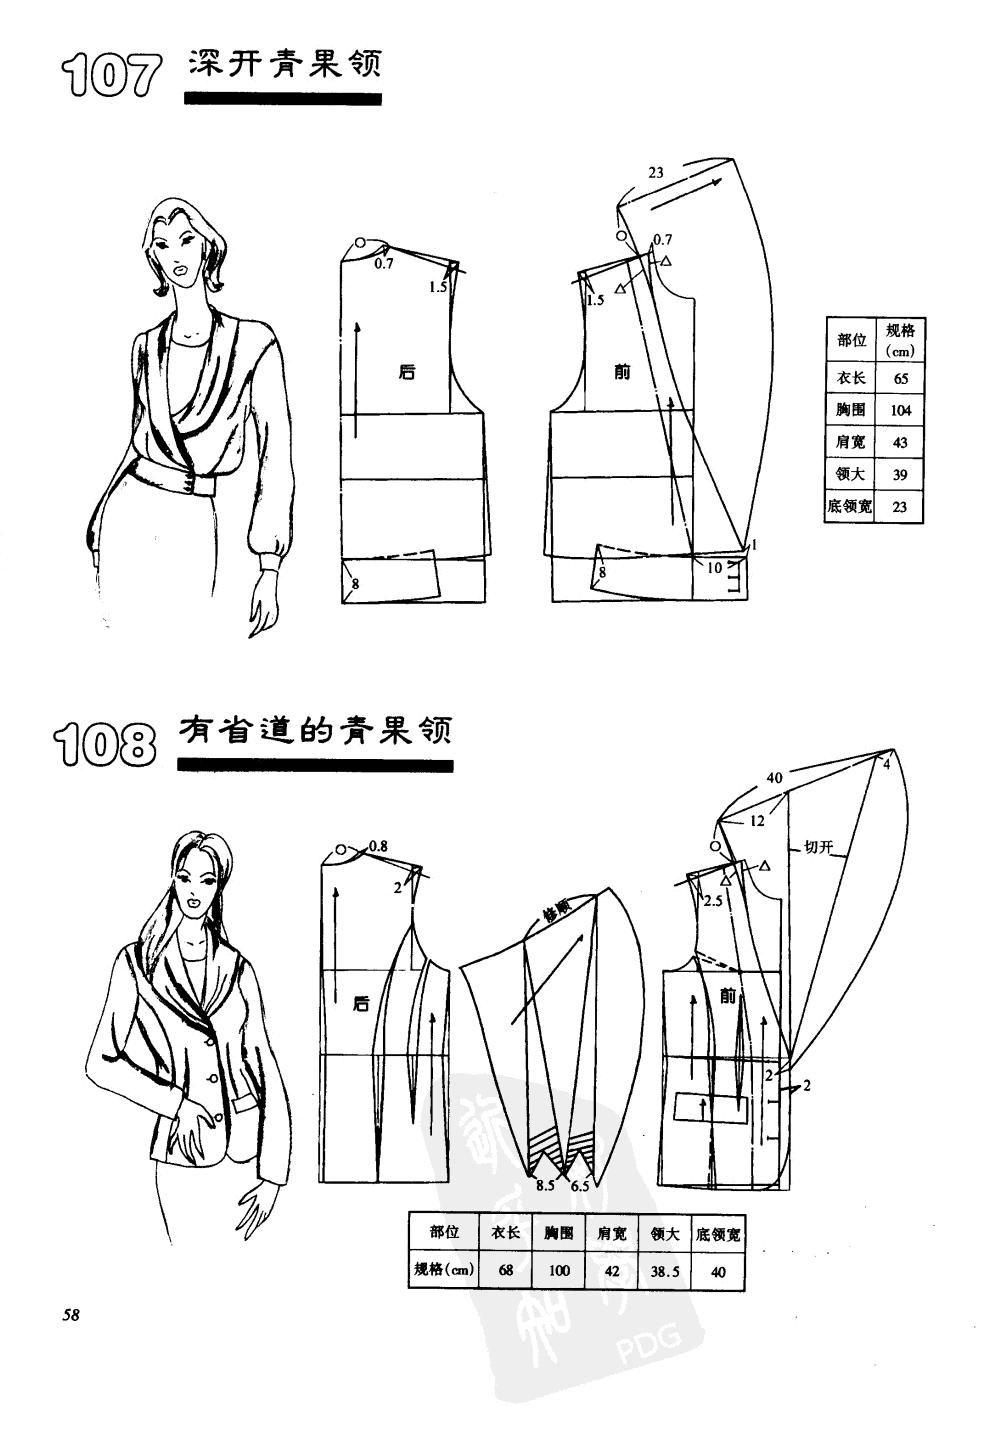 Collars sewing patternmaking dressmaking garment design collars sewing patternmaking dressmaking garment design jeuxipadfo Image collections